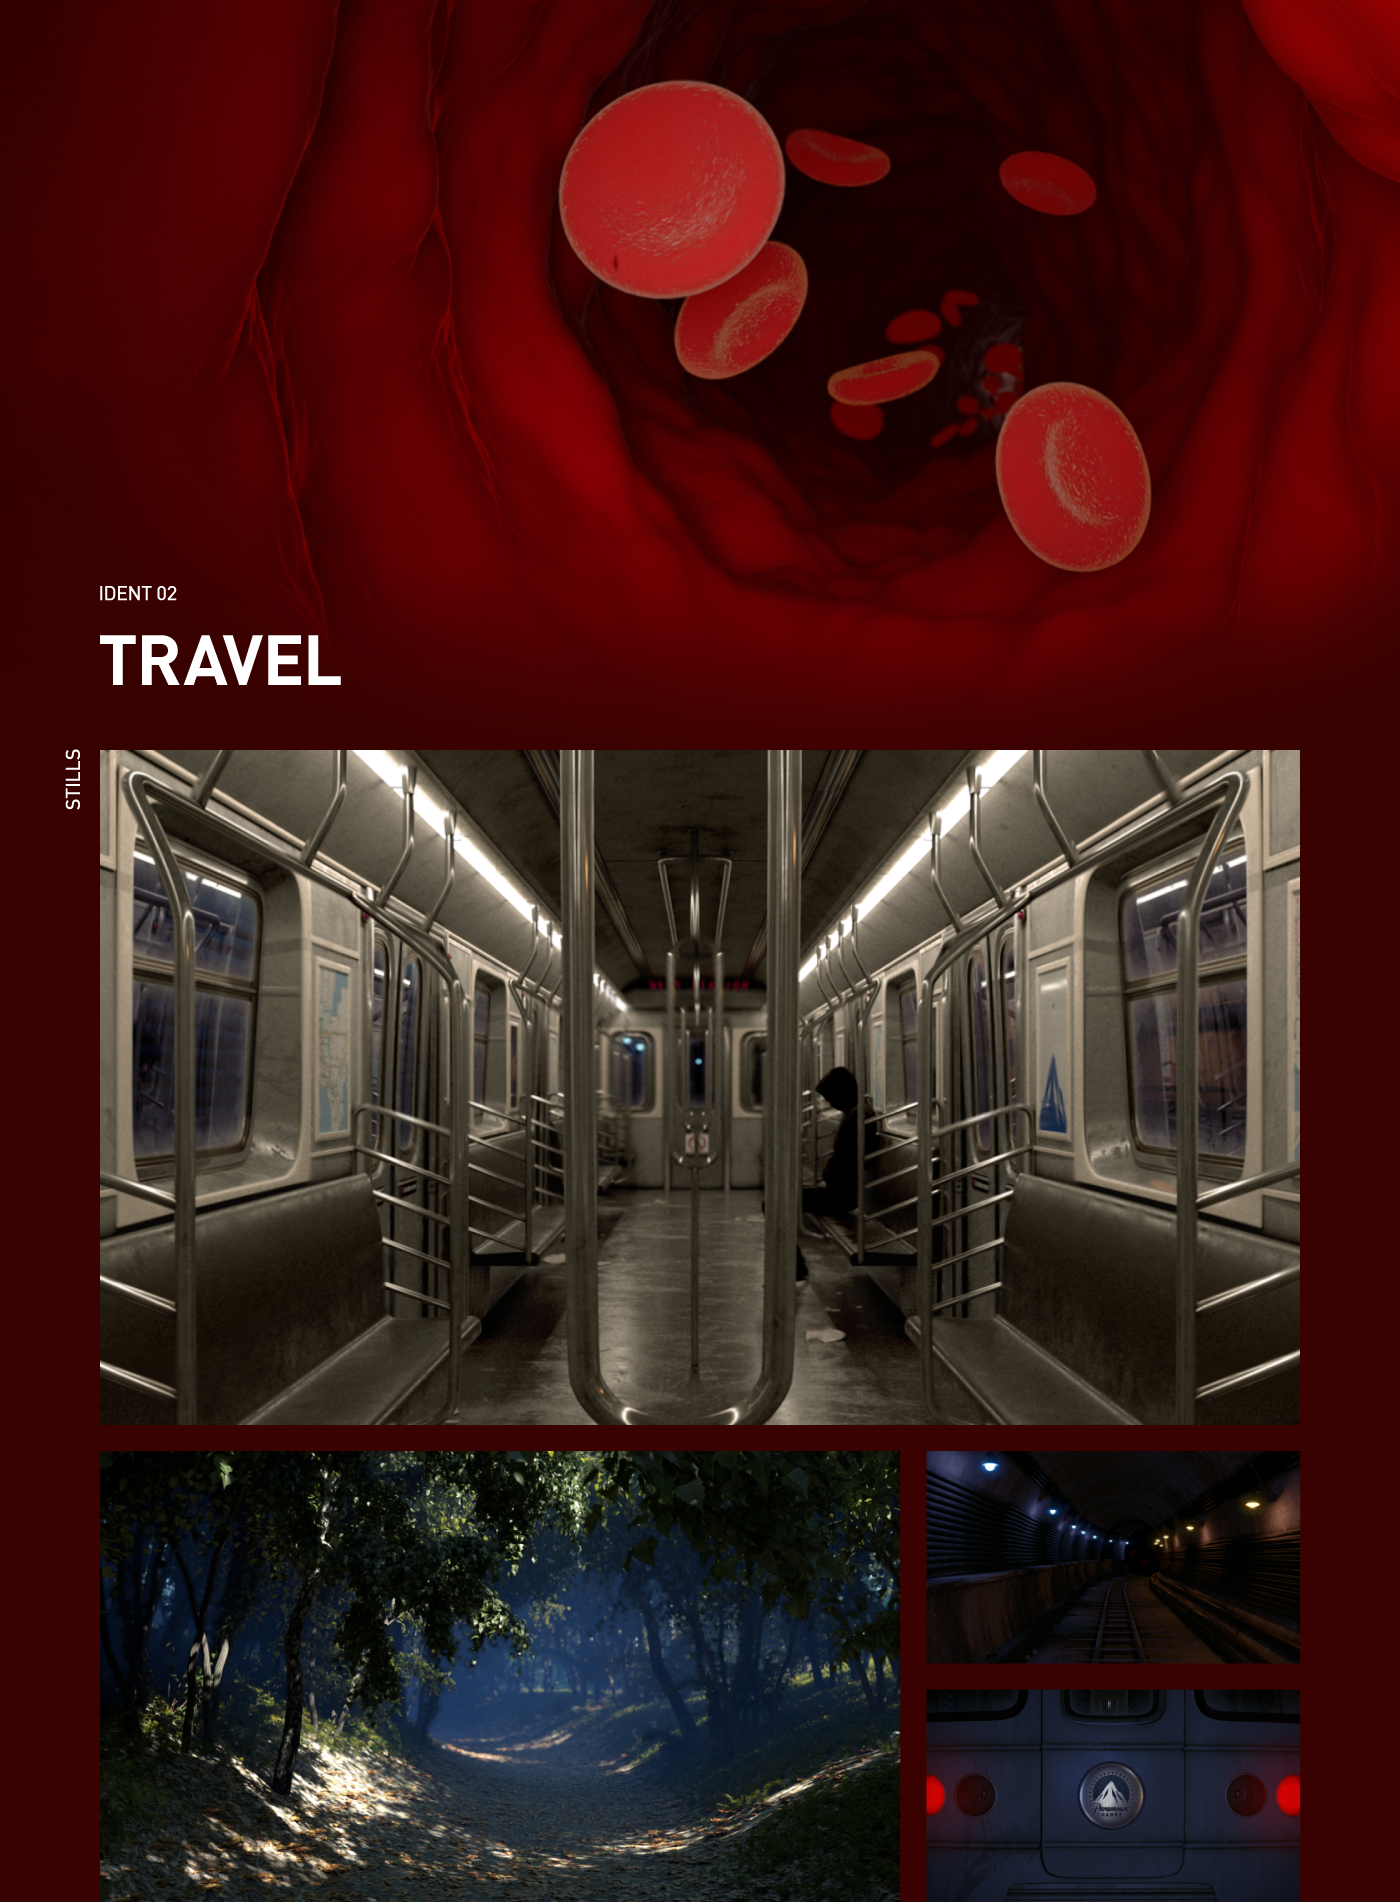 Film   Cinema story Genre 3D broadcast movie Transition CG macro